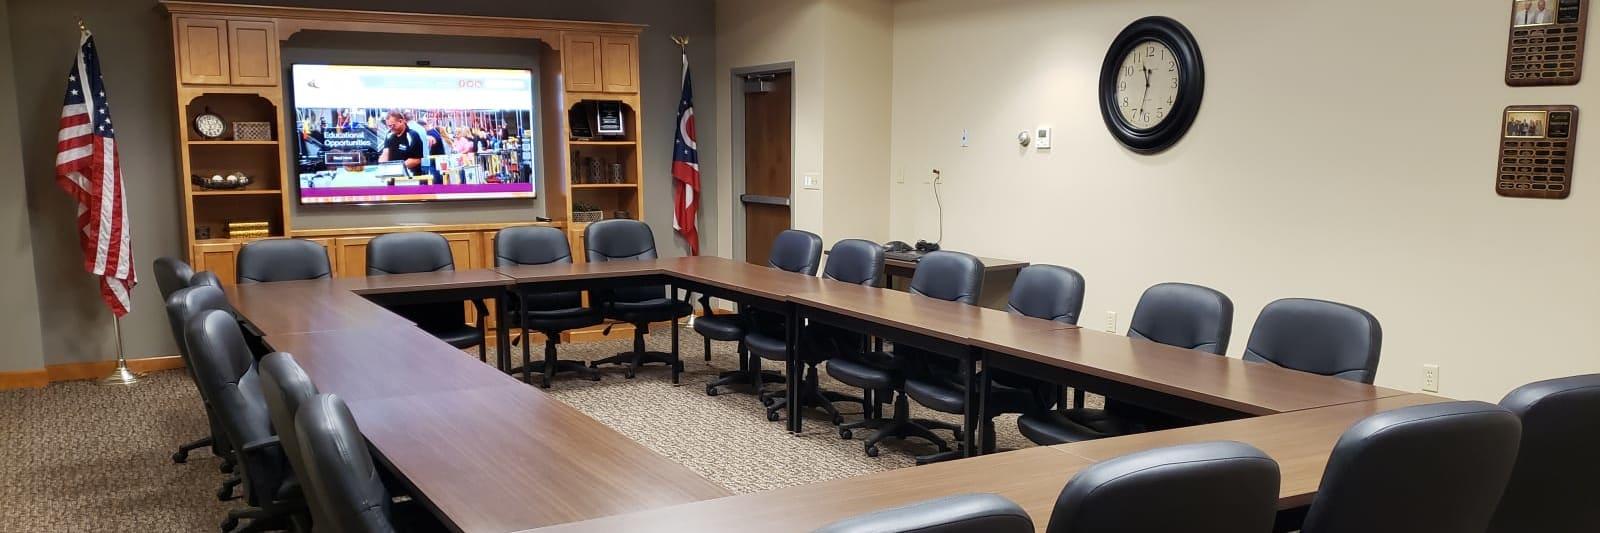 Conference-Room-2019-2(1).jpg